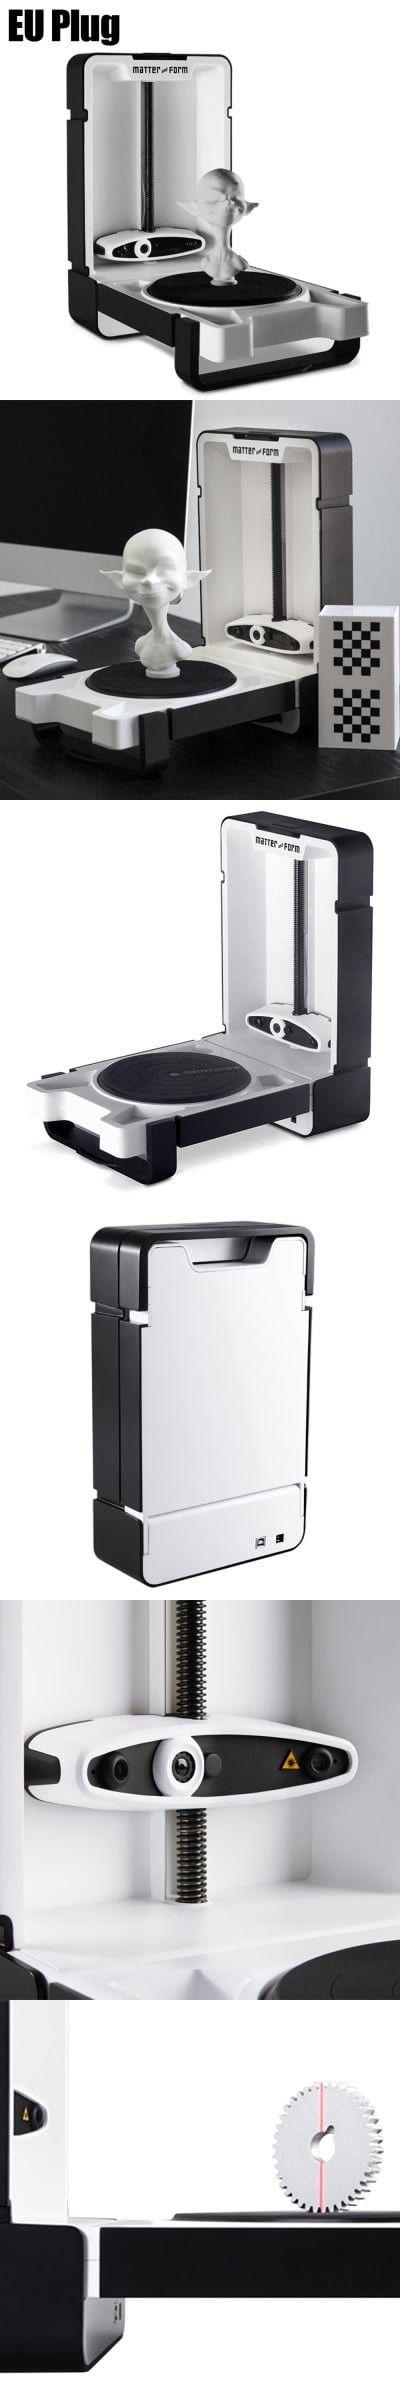 Matter and Form Folding 3D Scanner EU PLUG-$600.13